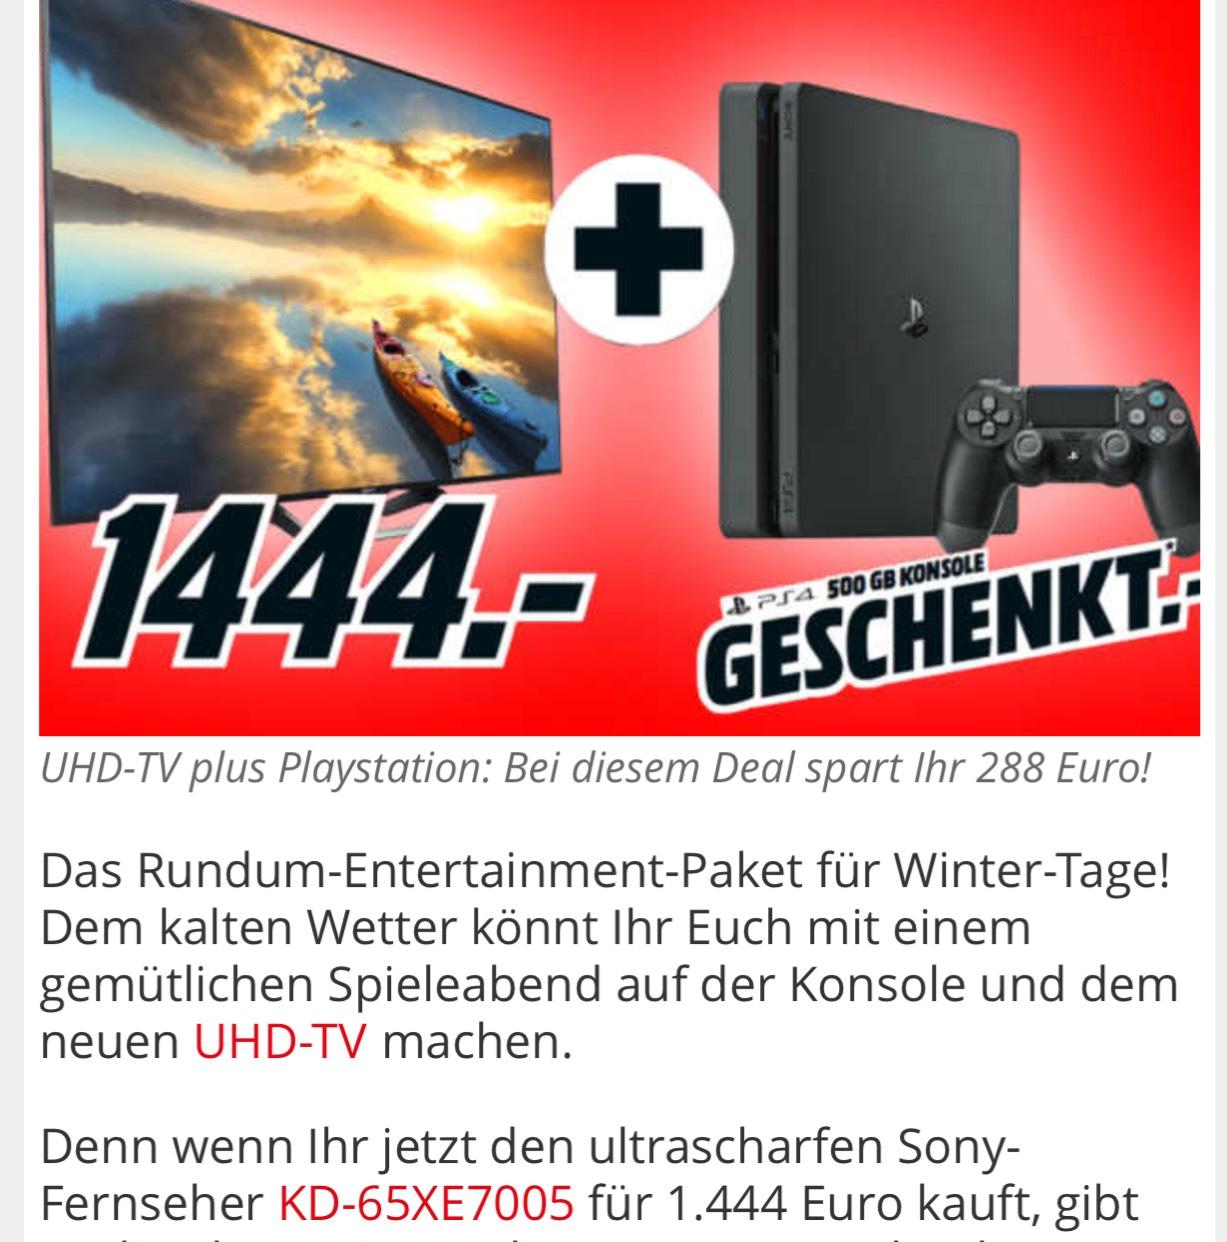 Media Markt- Sony 65 XE 7005+PS4 für 1